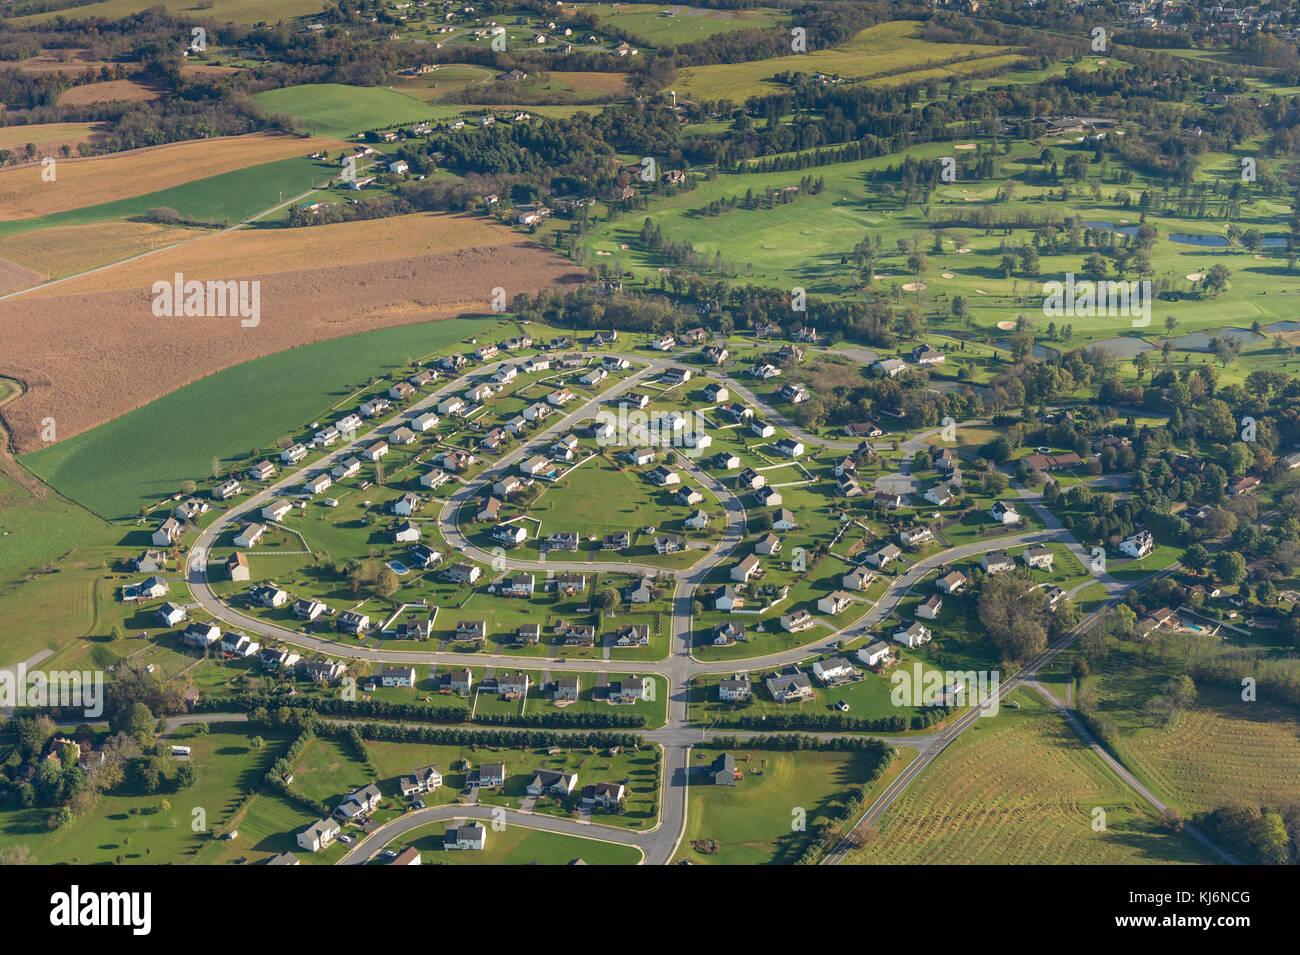 Aerial View Of Suburban Development - Stock Image